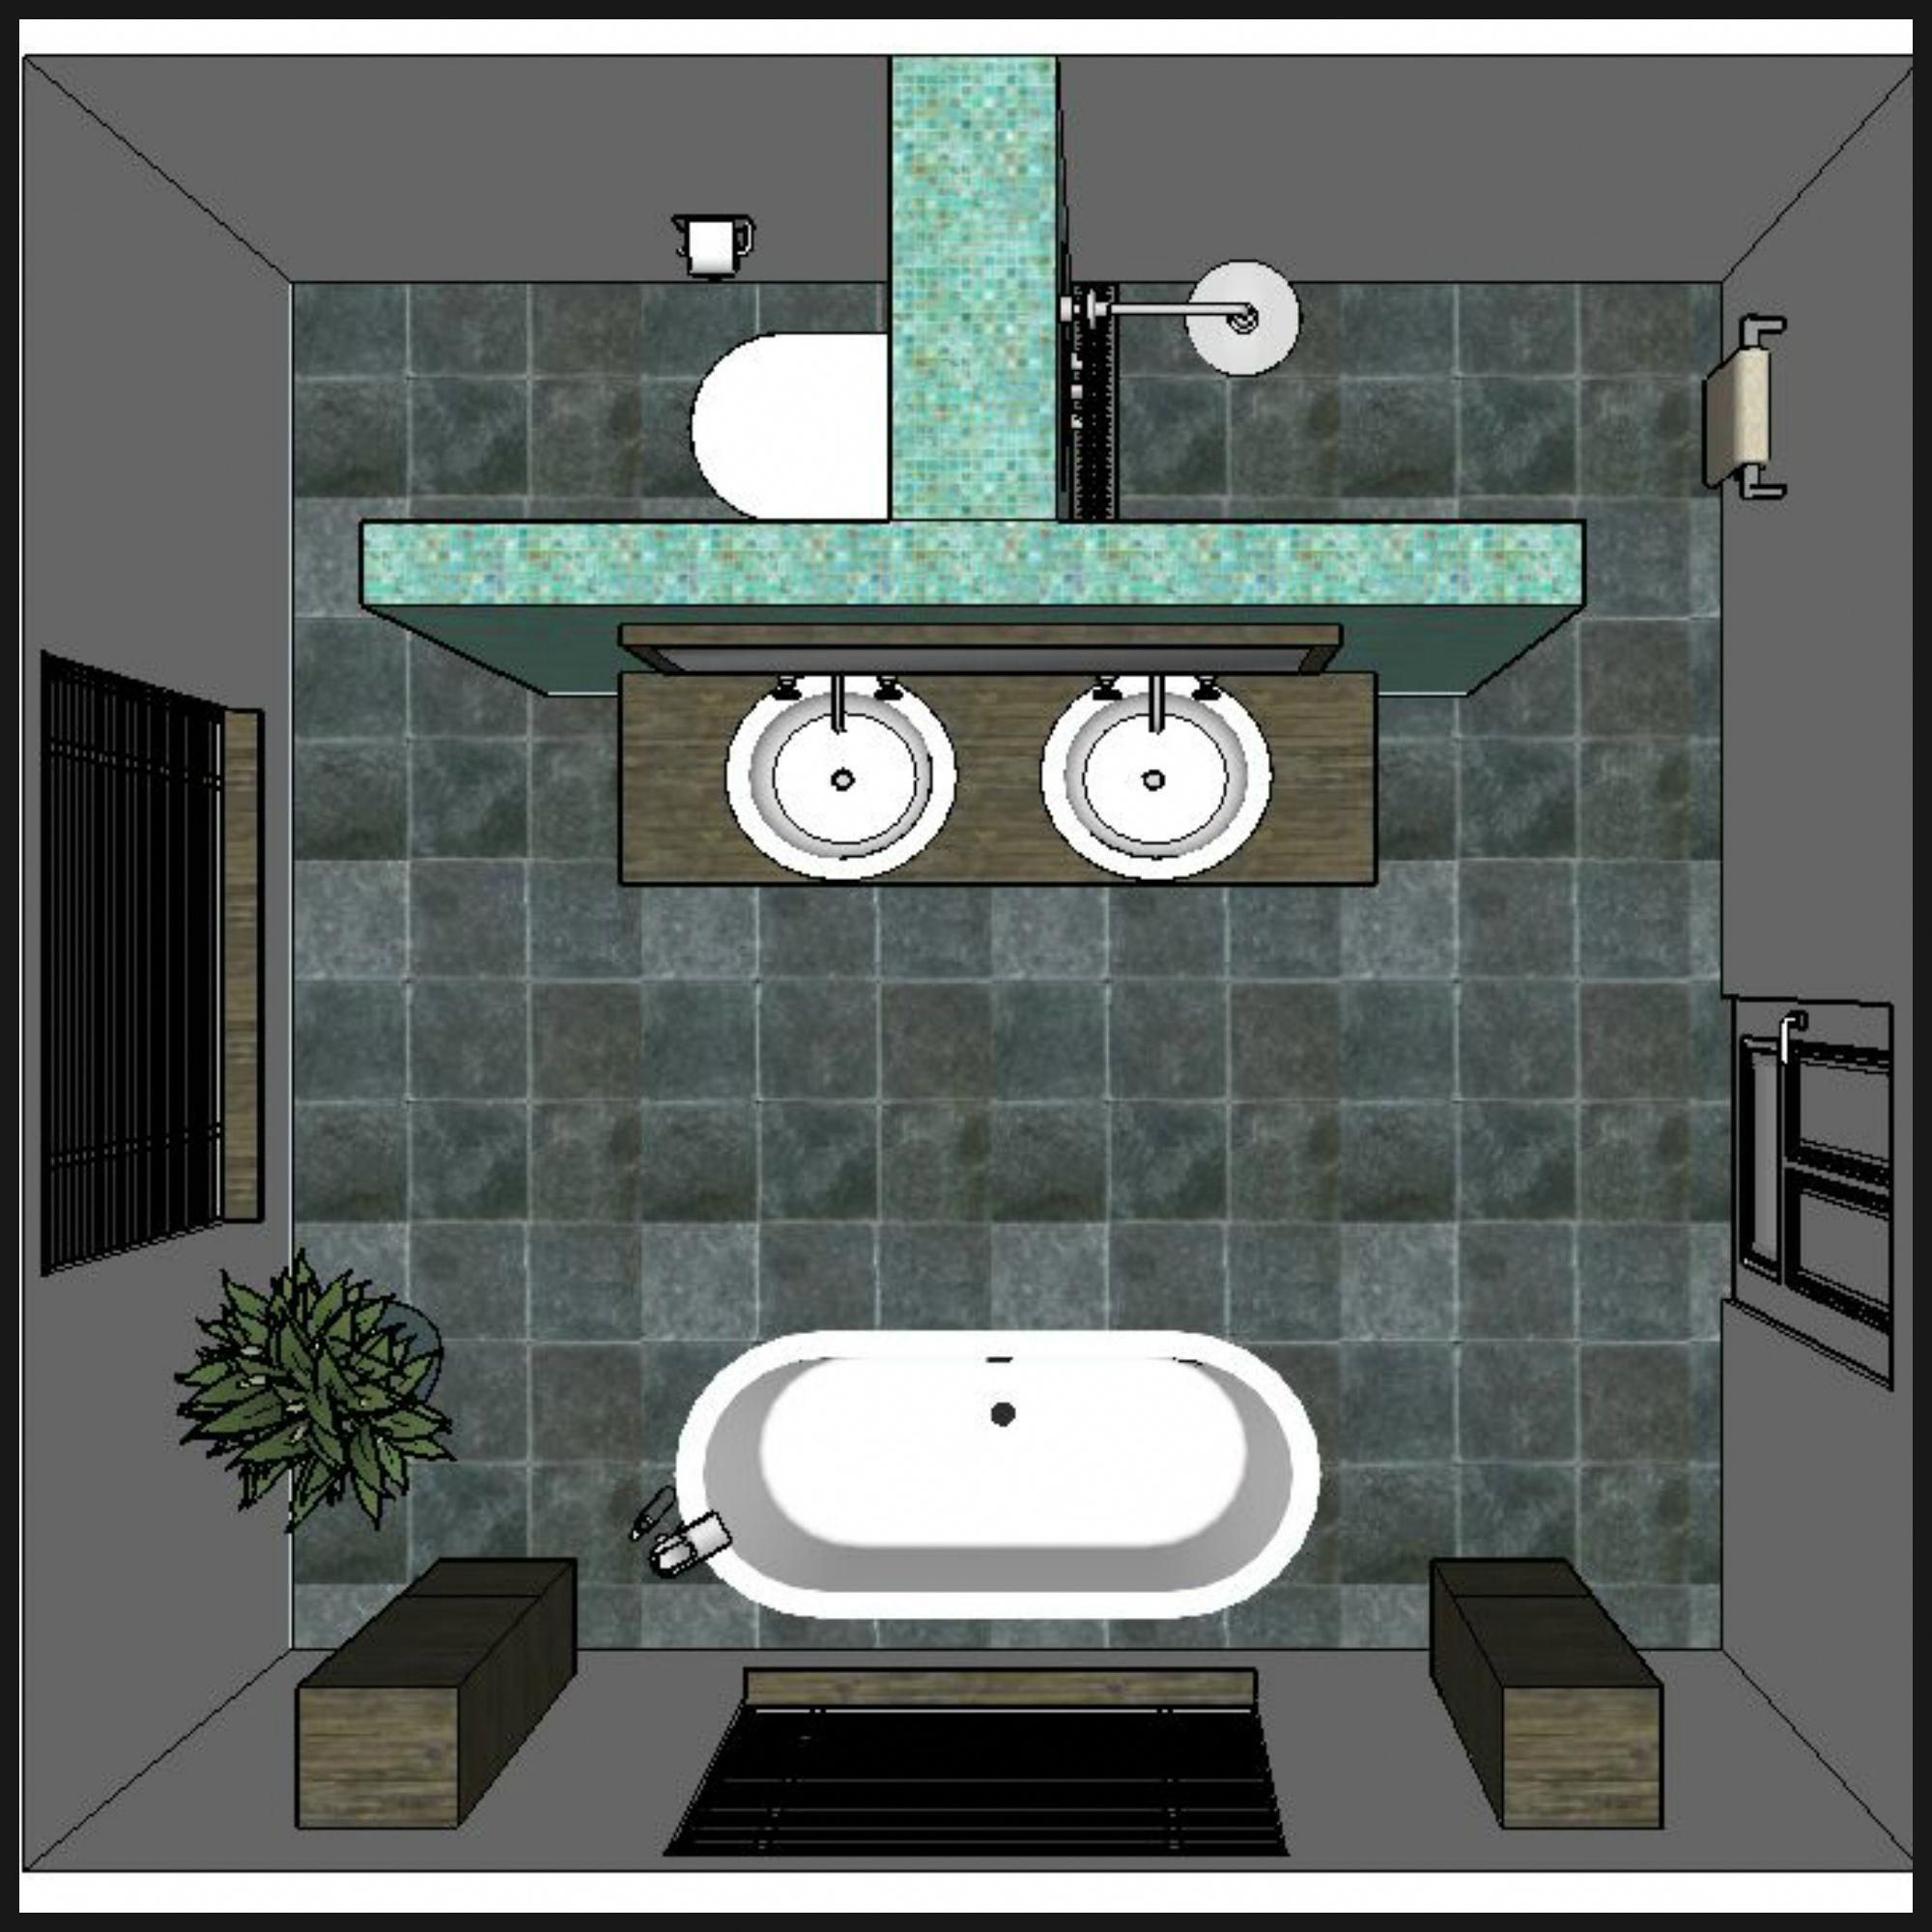 17+ Ambrosial Simple Bathroom Remodel Back Splashes Ideas images